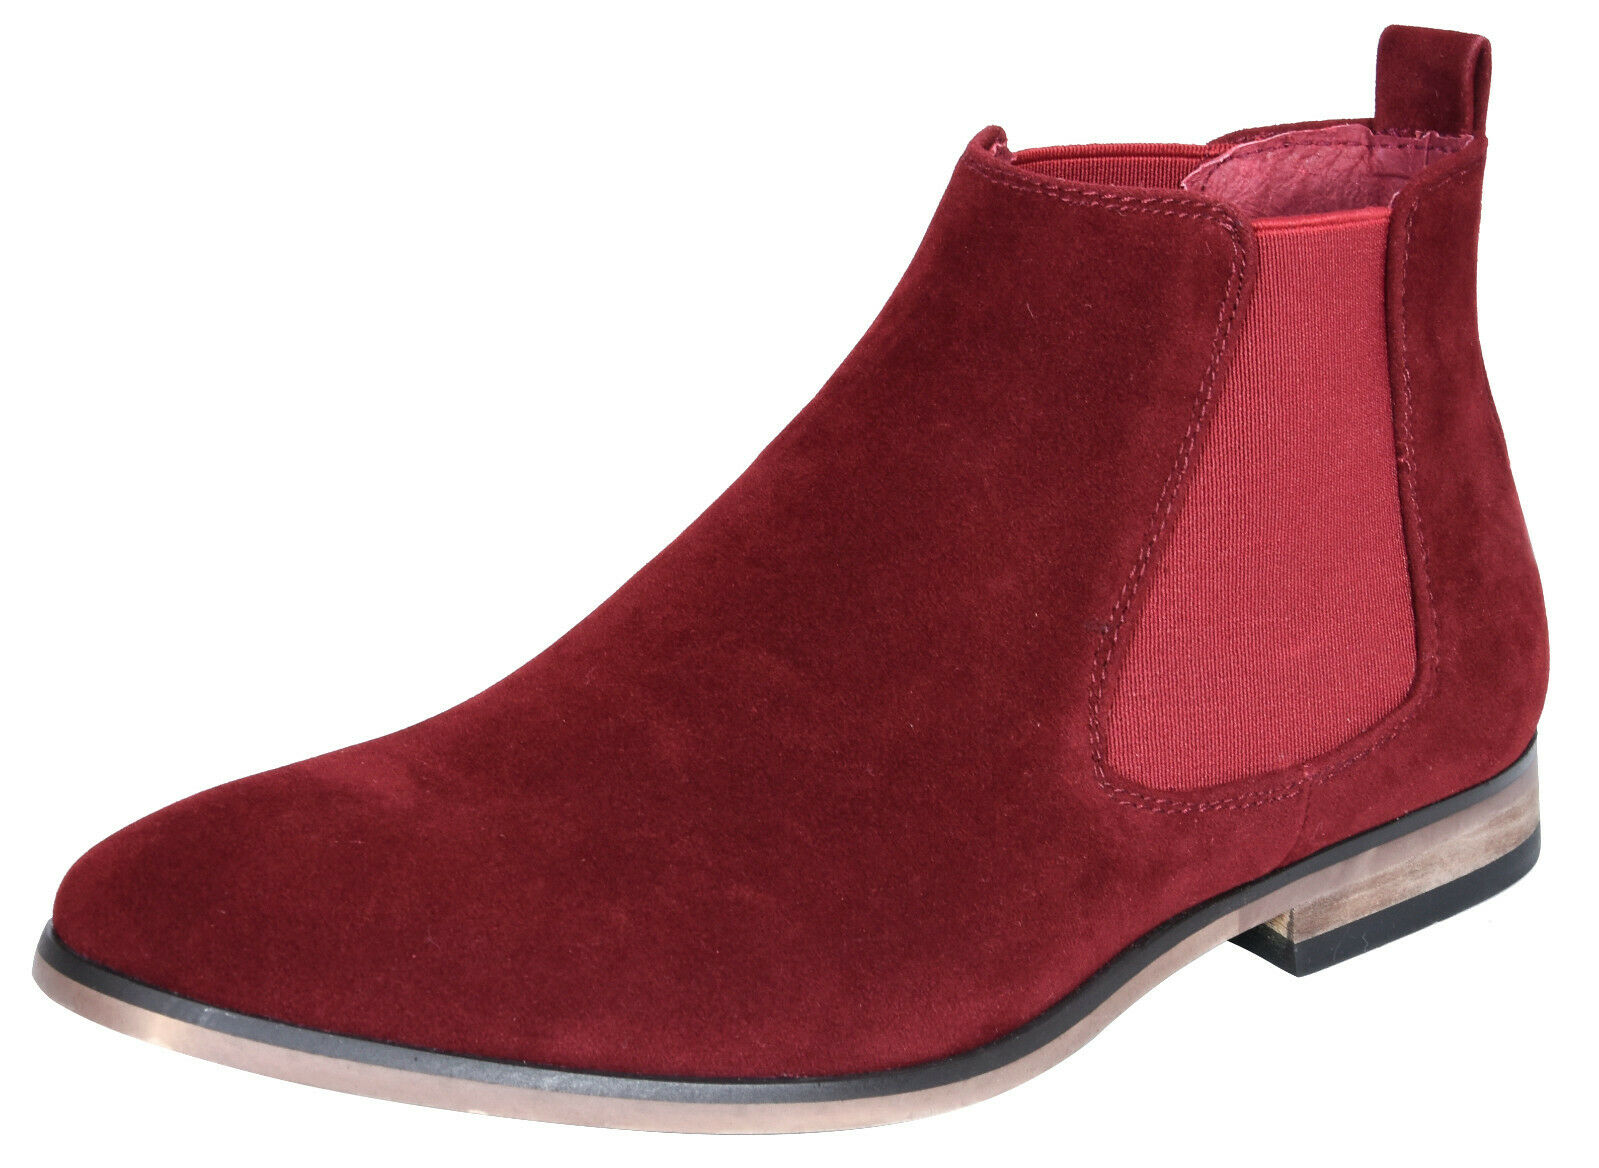 Mens Wine Italian Suede Chelsea Ankle Boots Smart Casual Desert Dealer Slip On